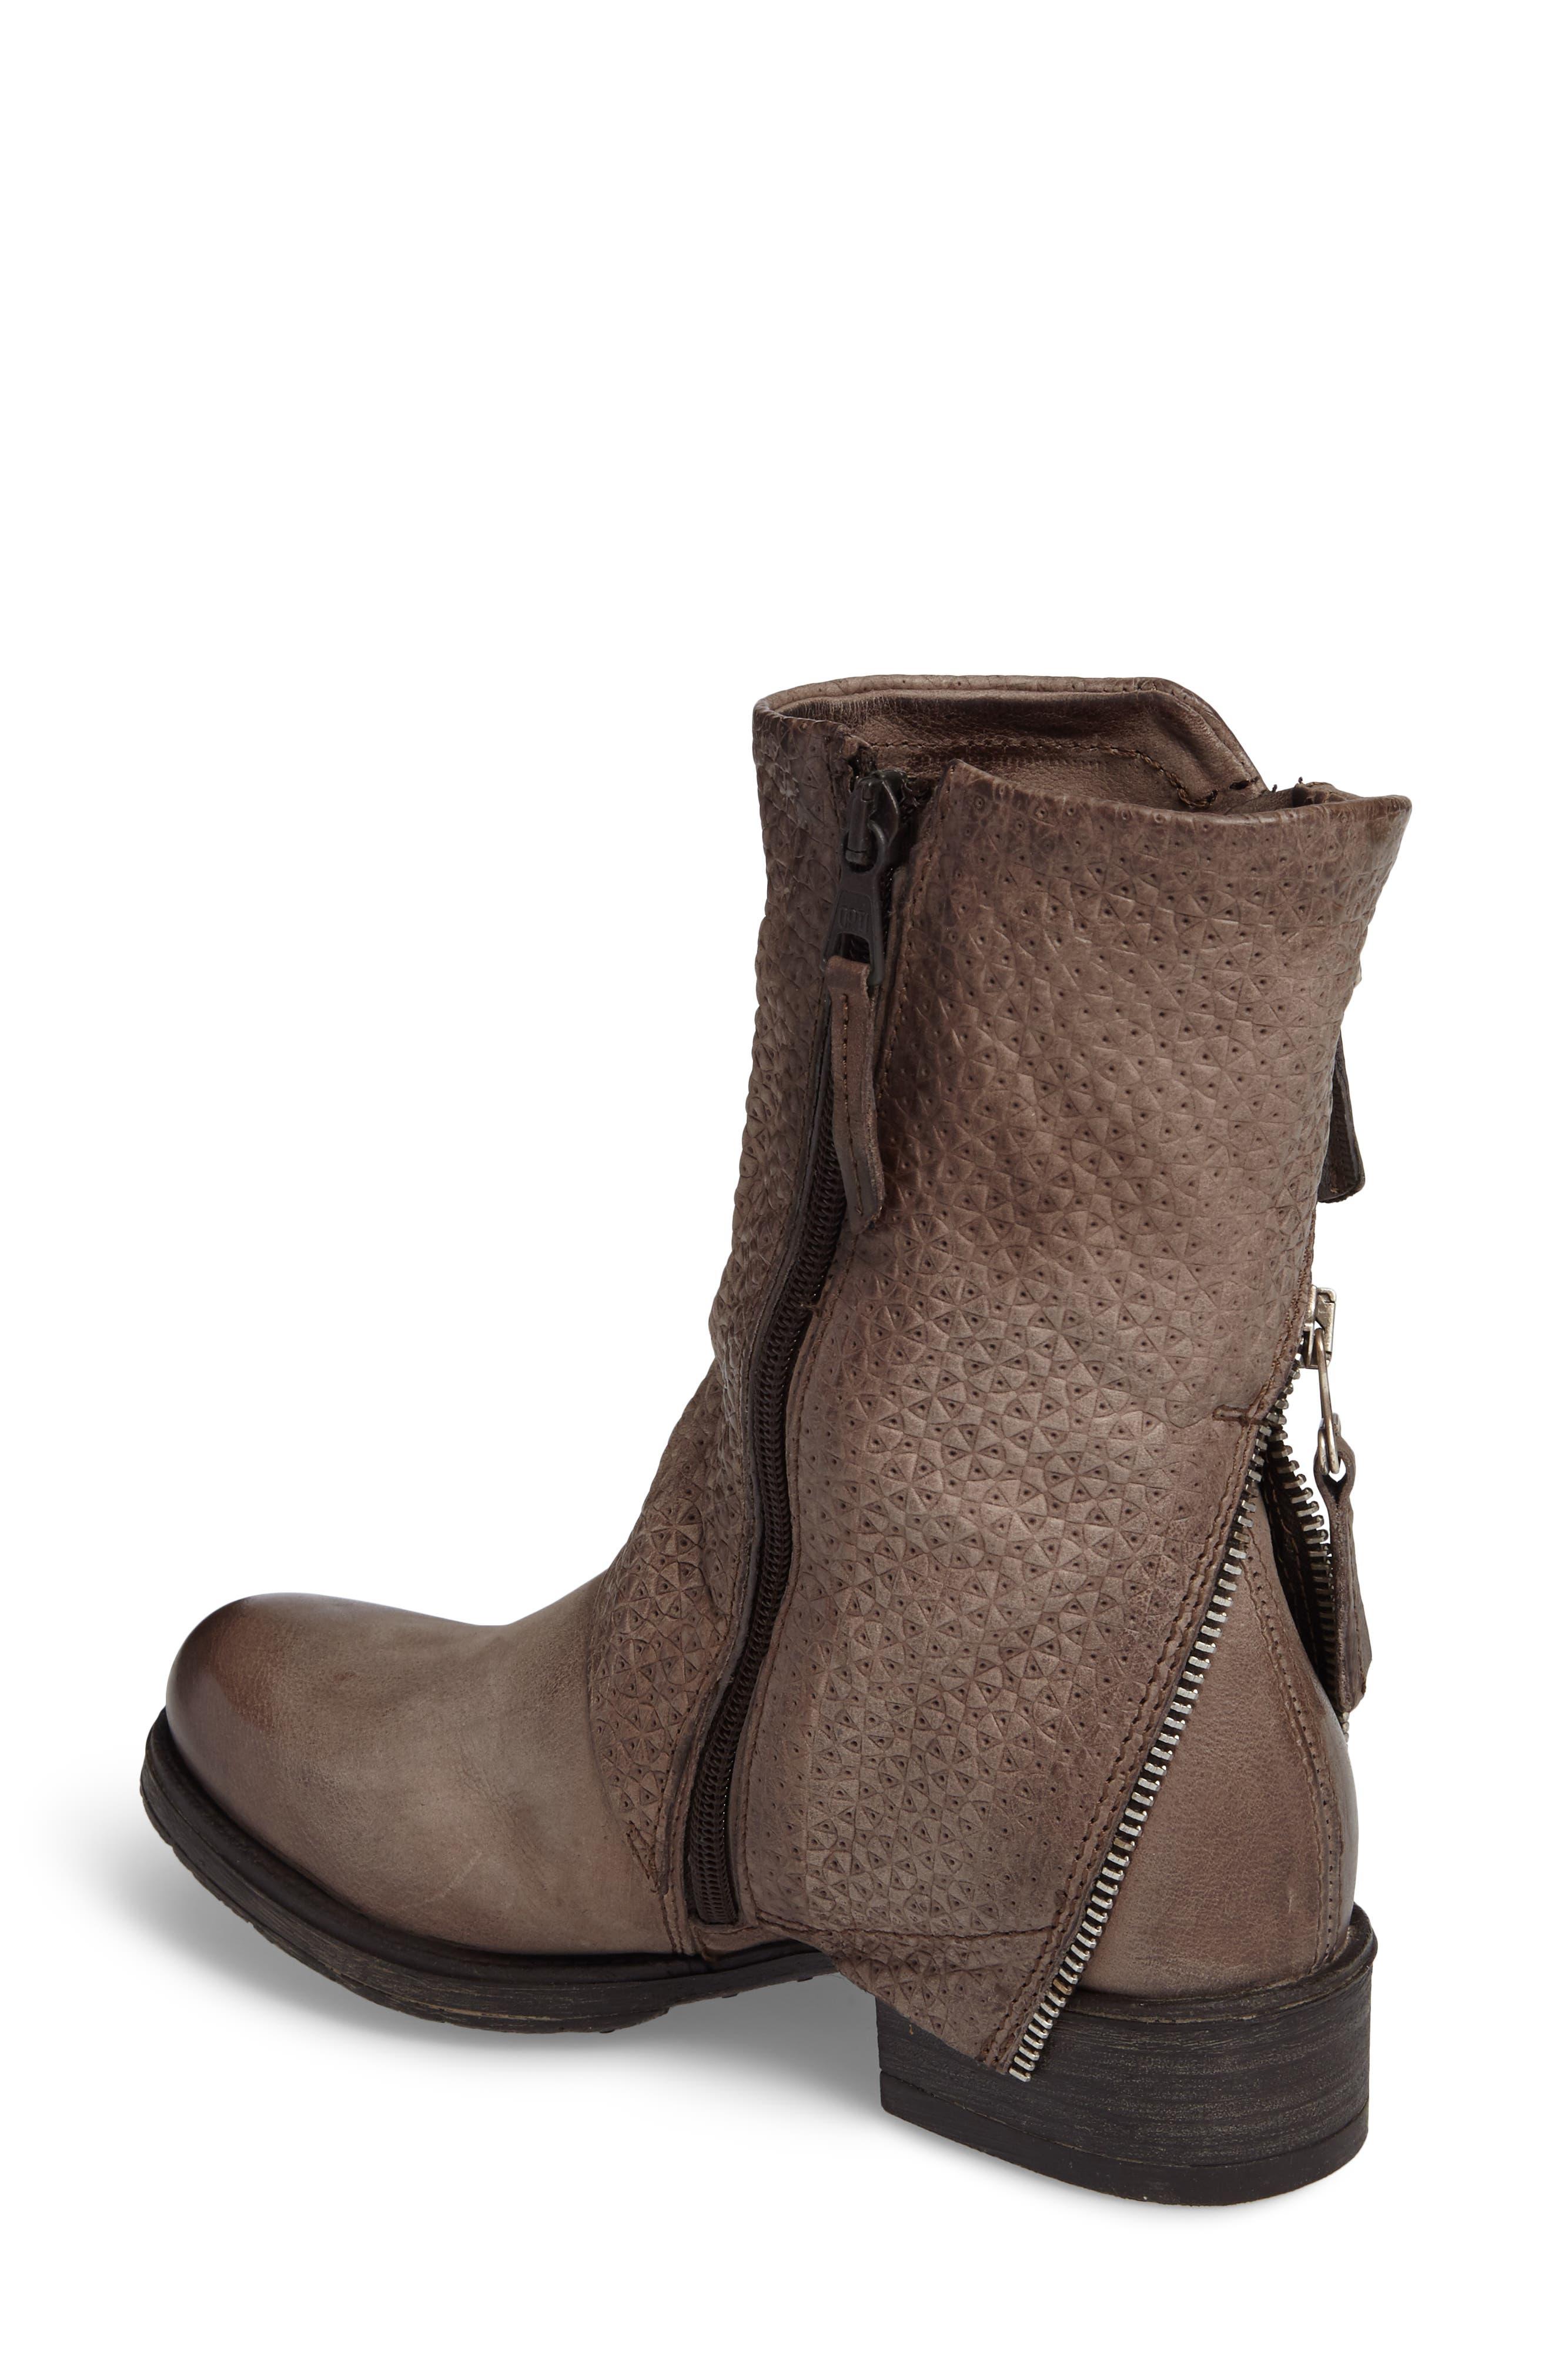 Nugget Asymmetrical Textured Boot,                             Alternate thumbnail 2, color,                             Ash